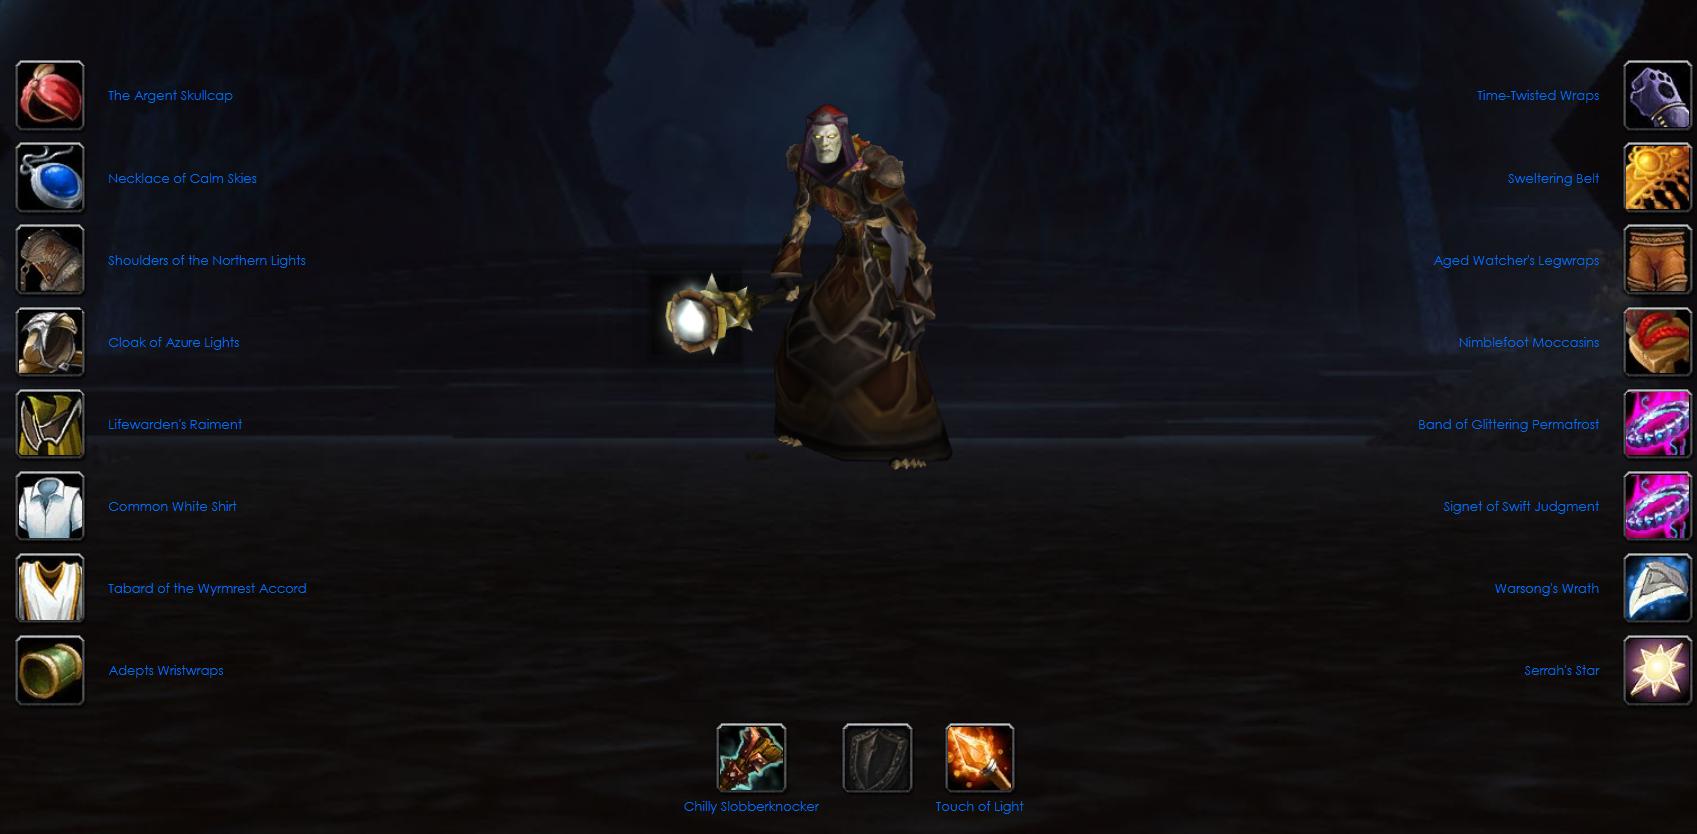 Undead male warlock voltarus